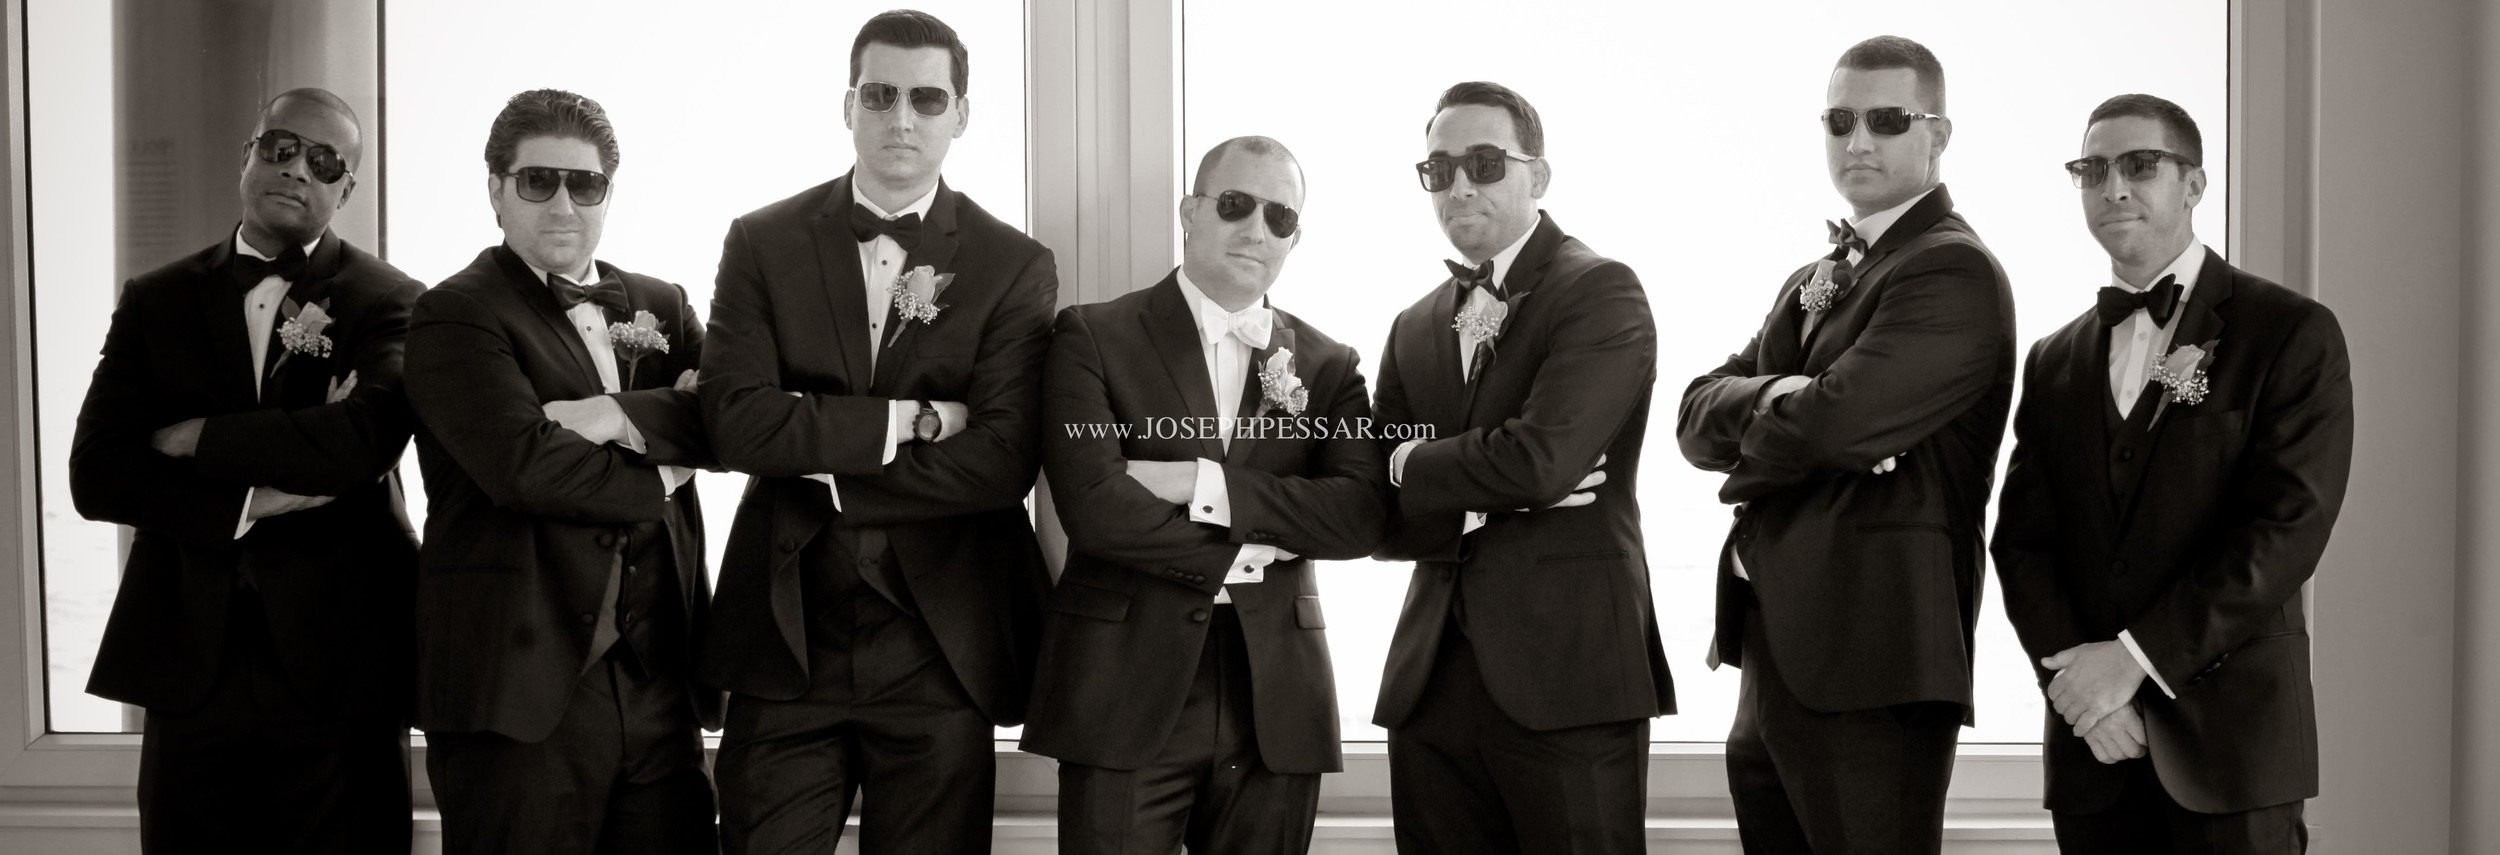 nyc_wedding_photographer0032.jpg